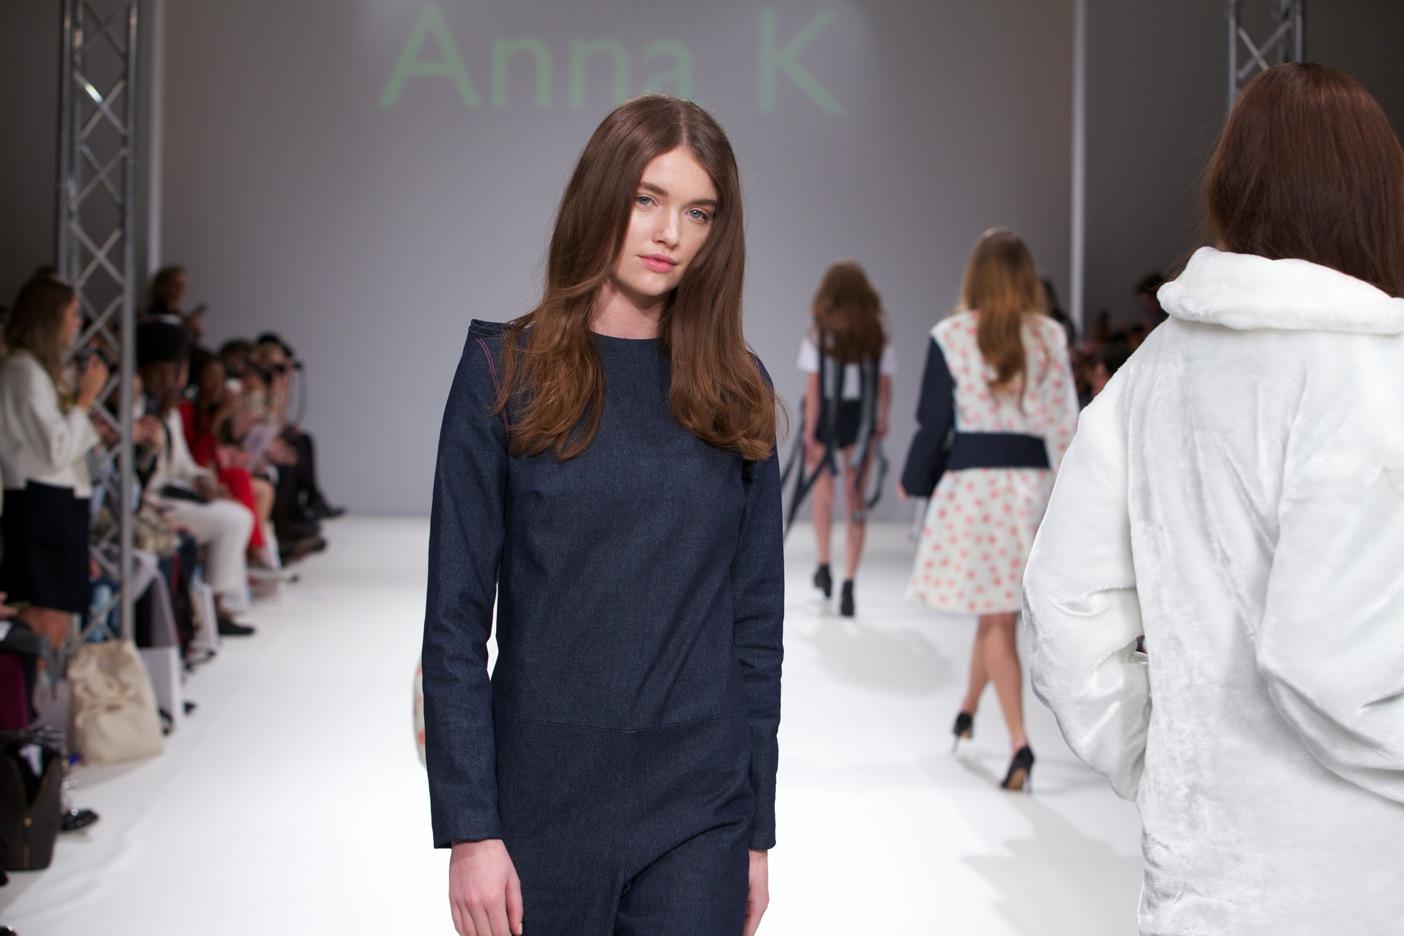 Kiev Fashion Days A-W 2014 (c) Marc aitken 2014  15.jpg